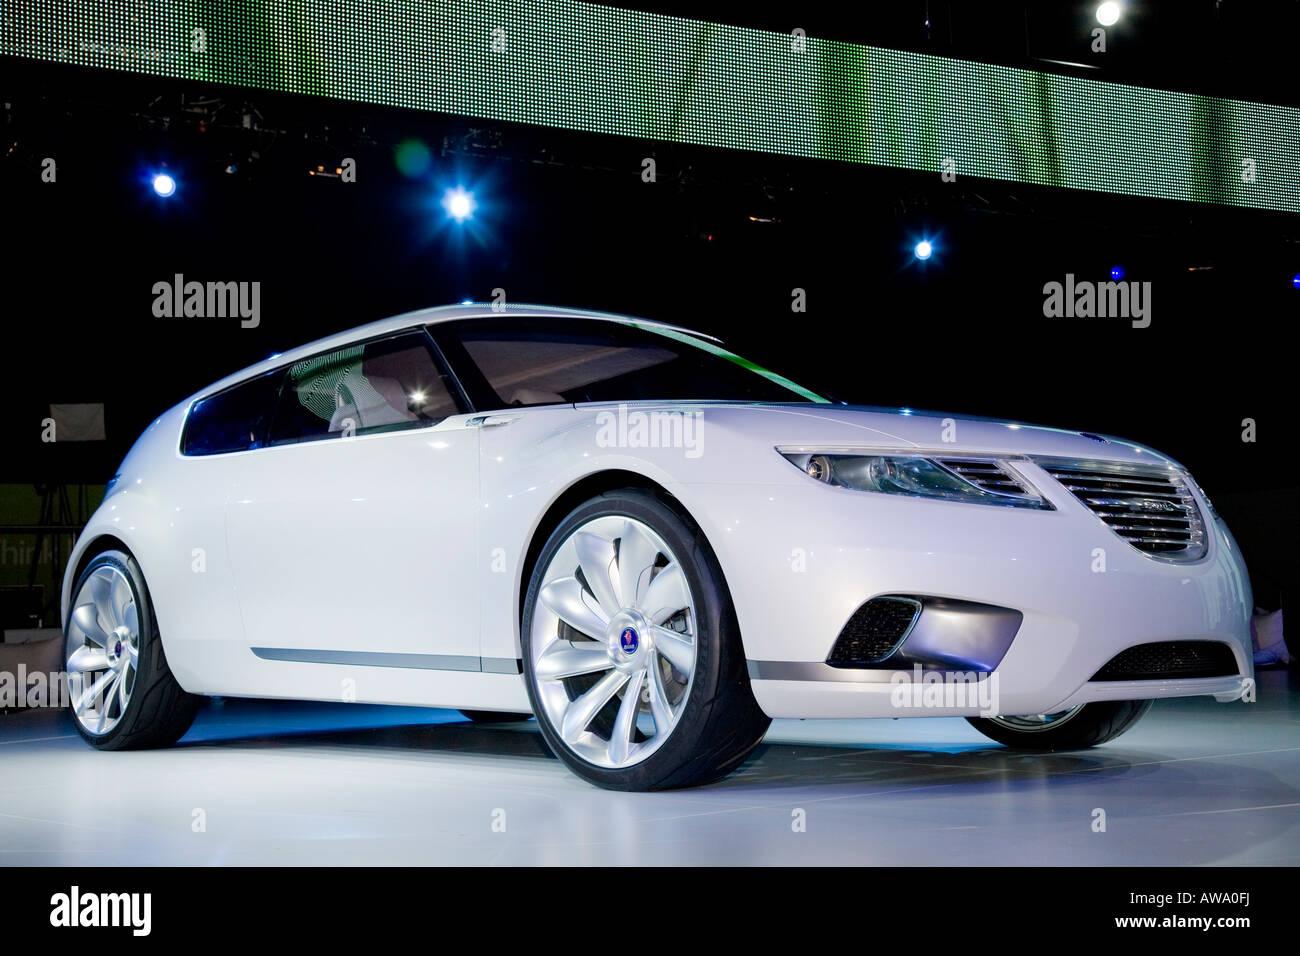 GM's Saab 9-X BioHybrid concept launch - Stock Image